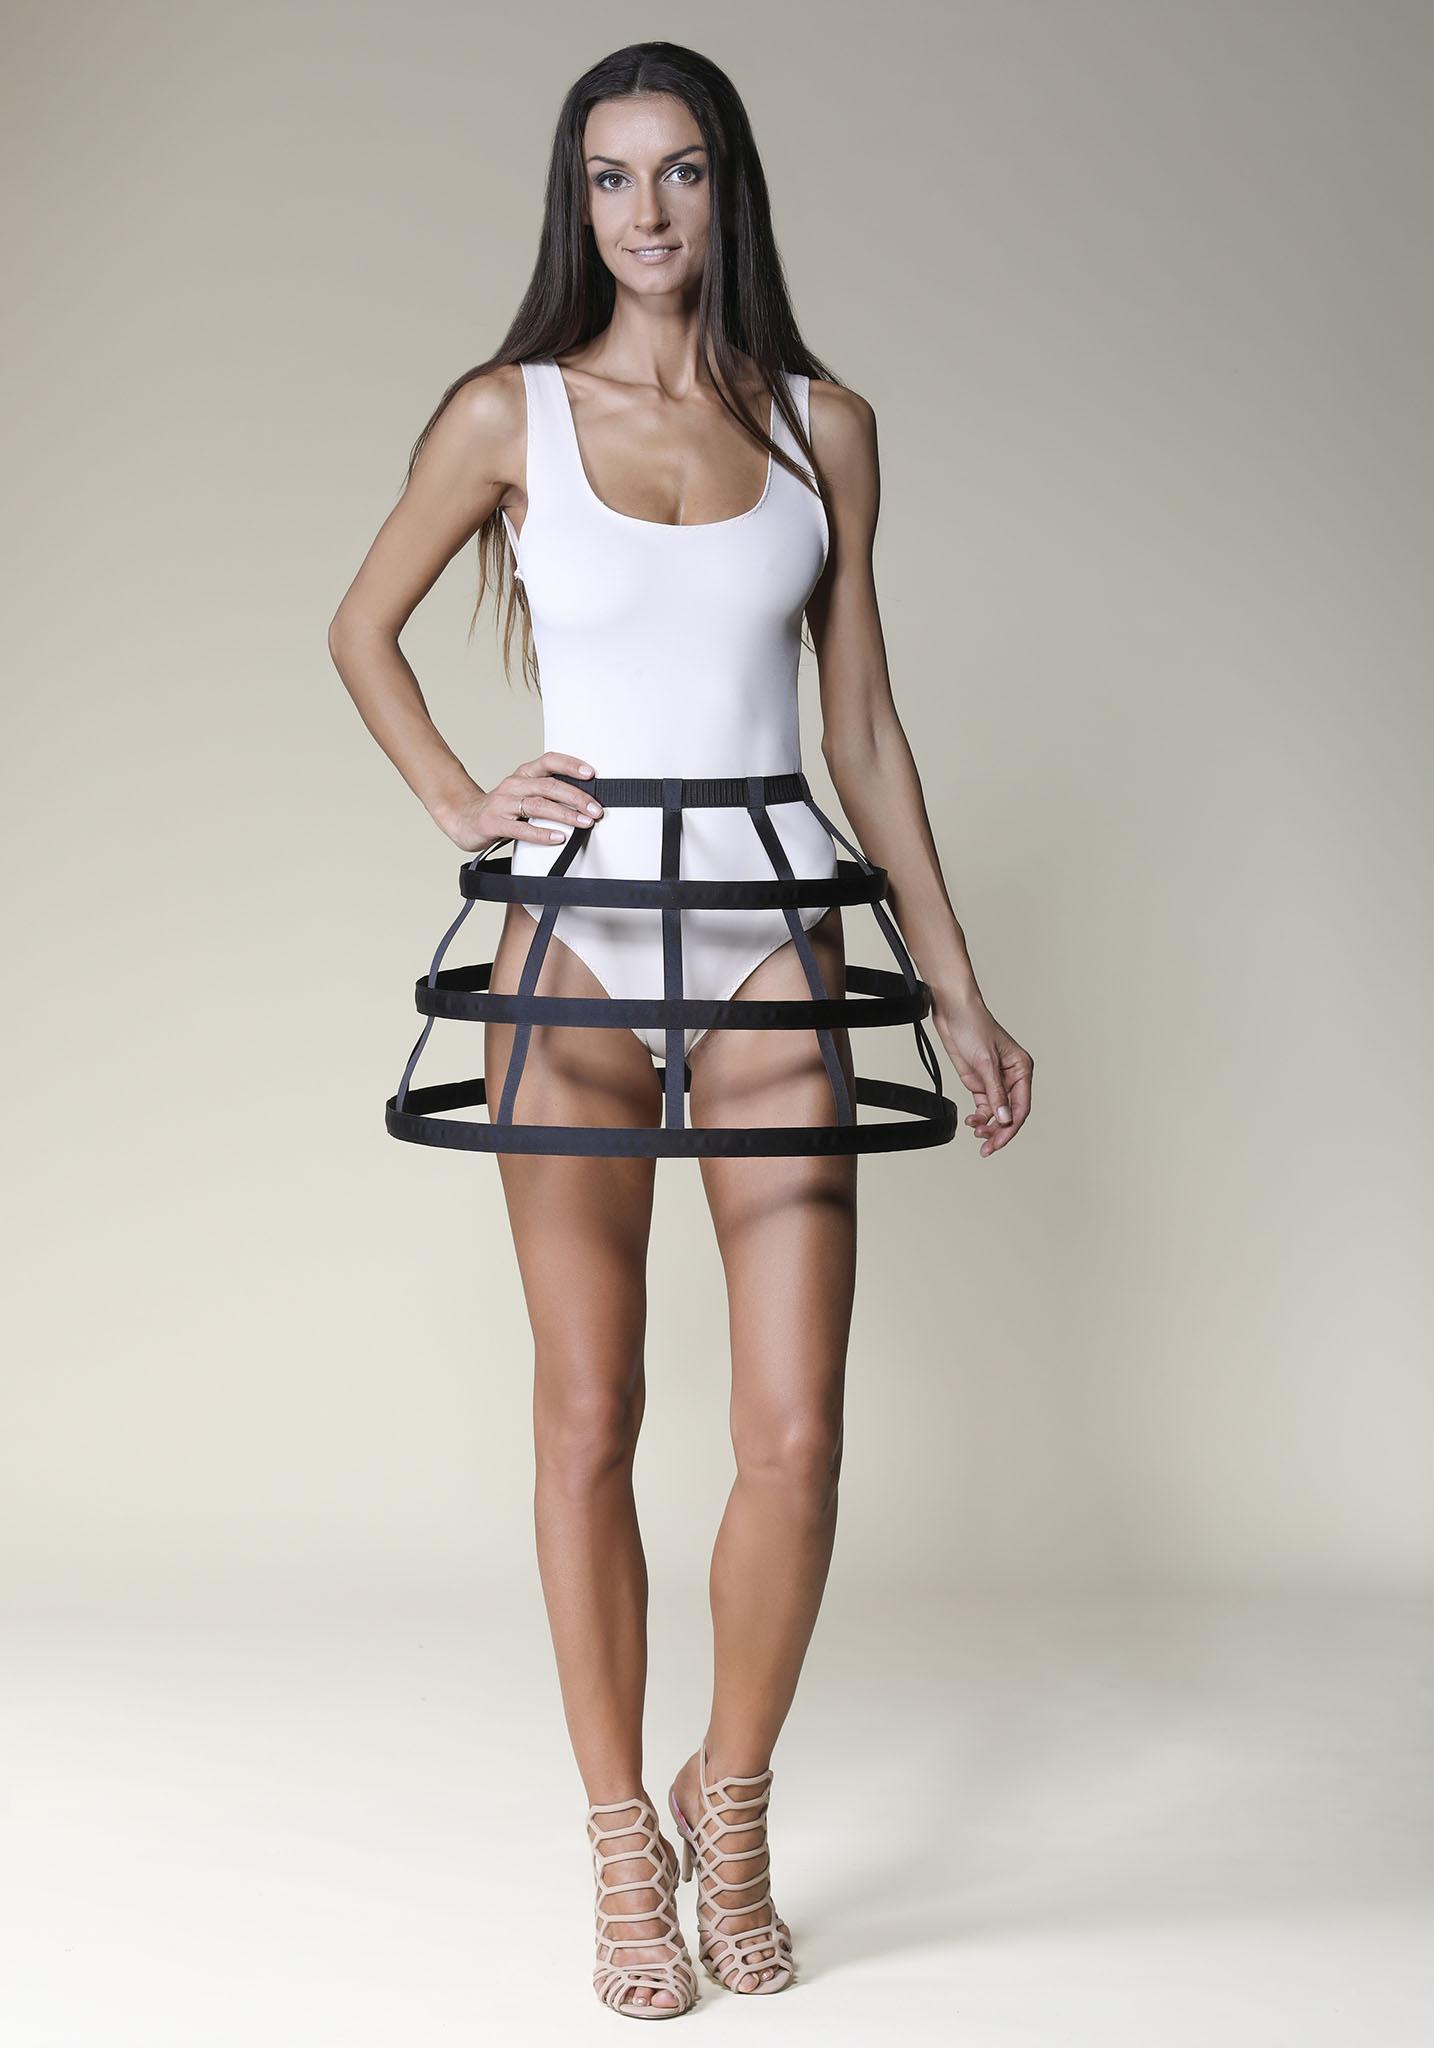 d3accdb46466 Basic Short Black Cage Skirt - Offeradi